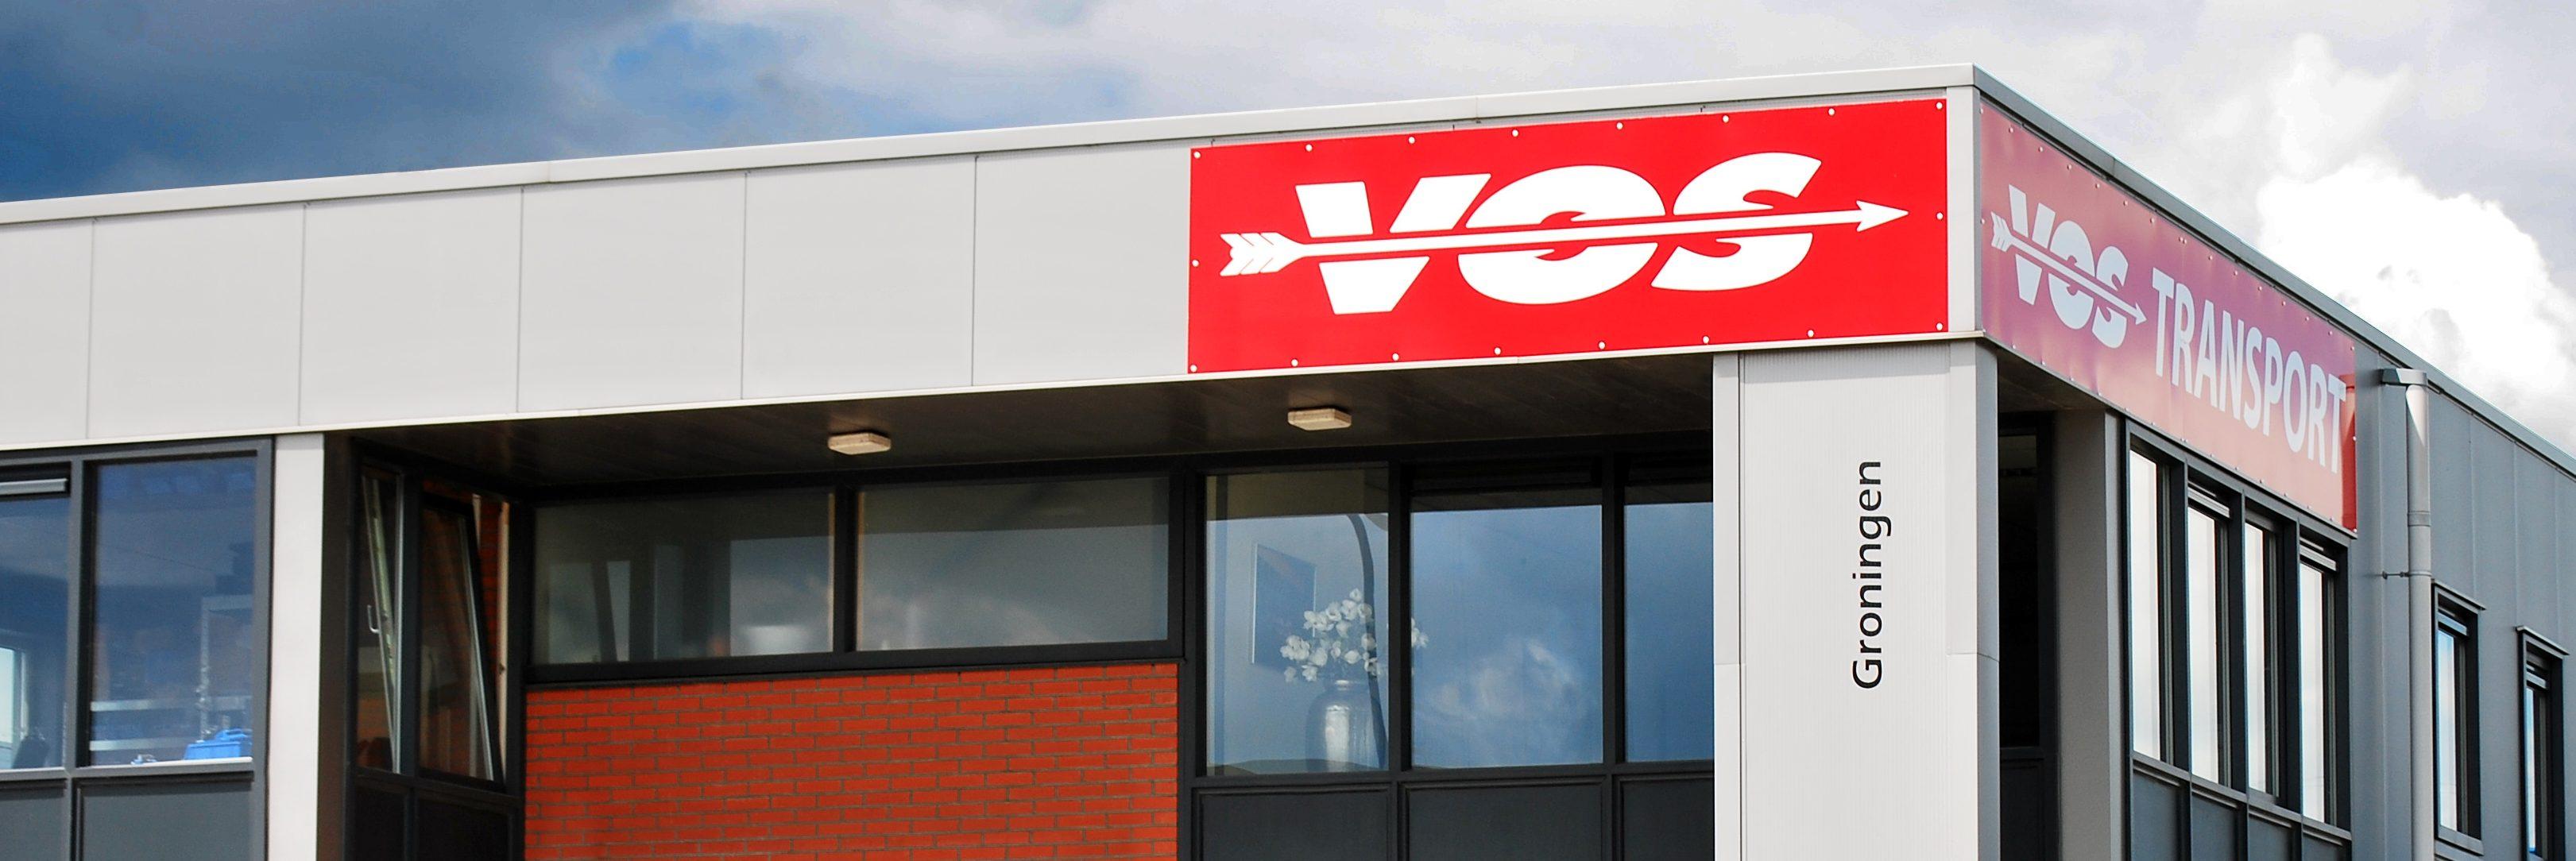 Vestiging Groningen Vos Transport